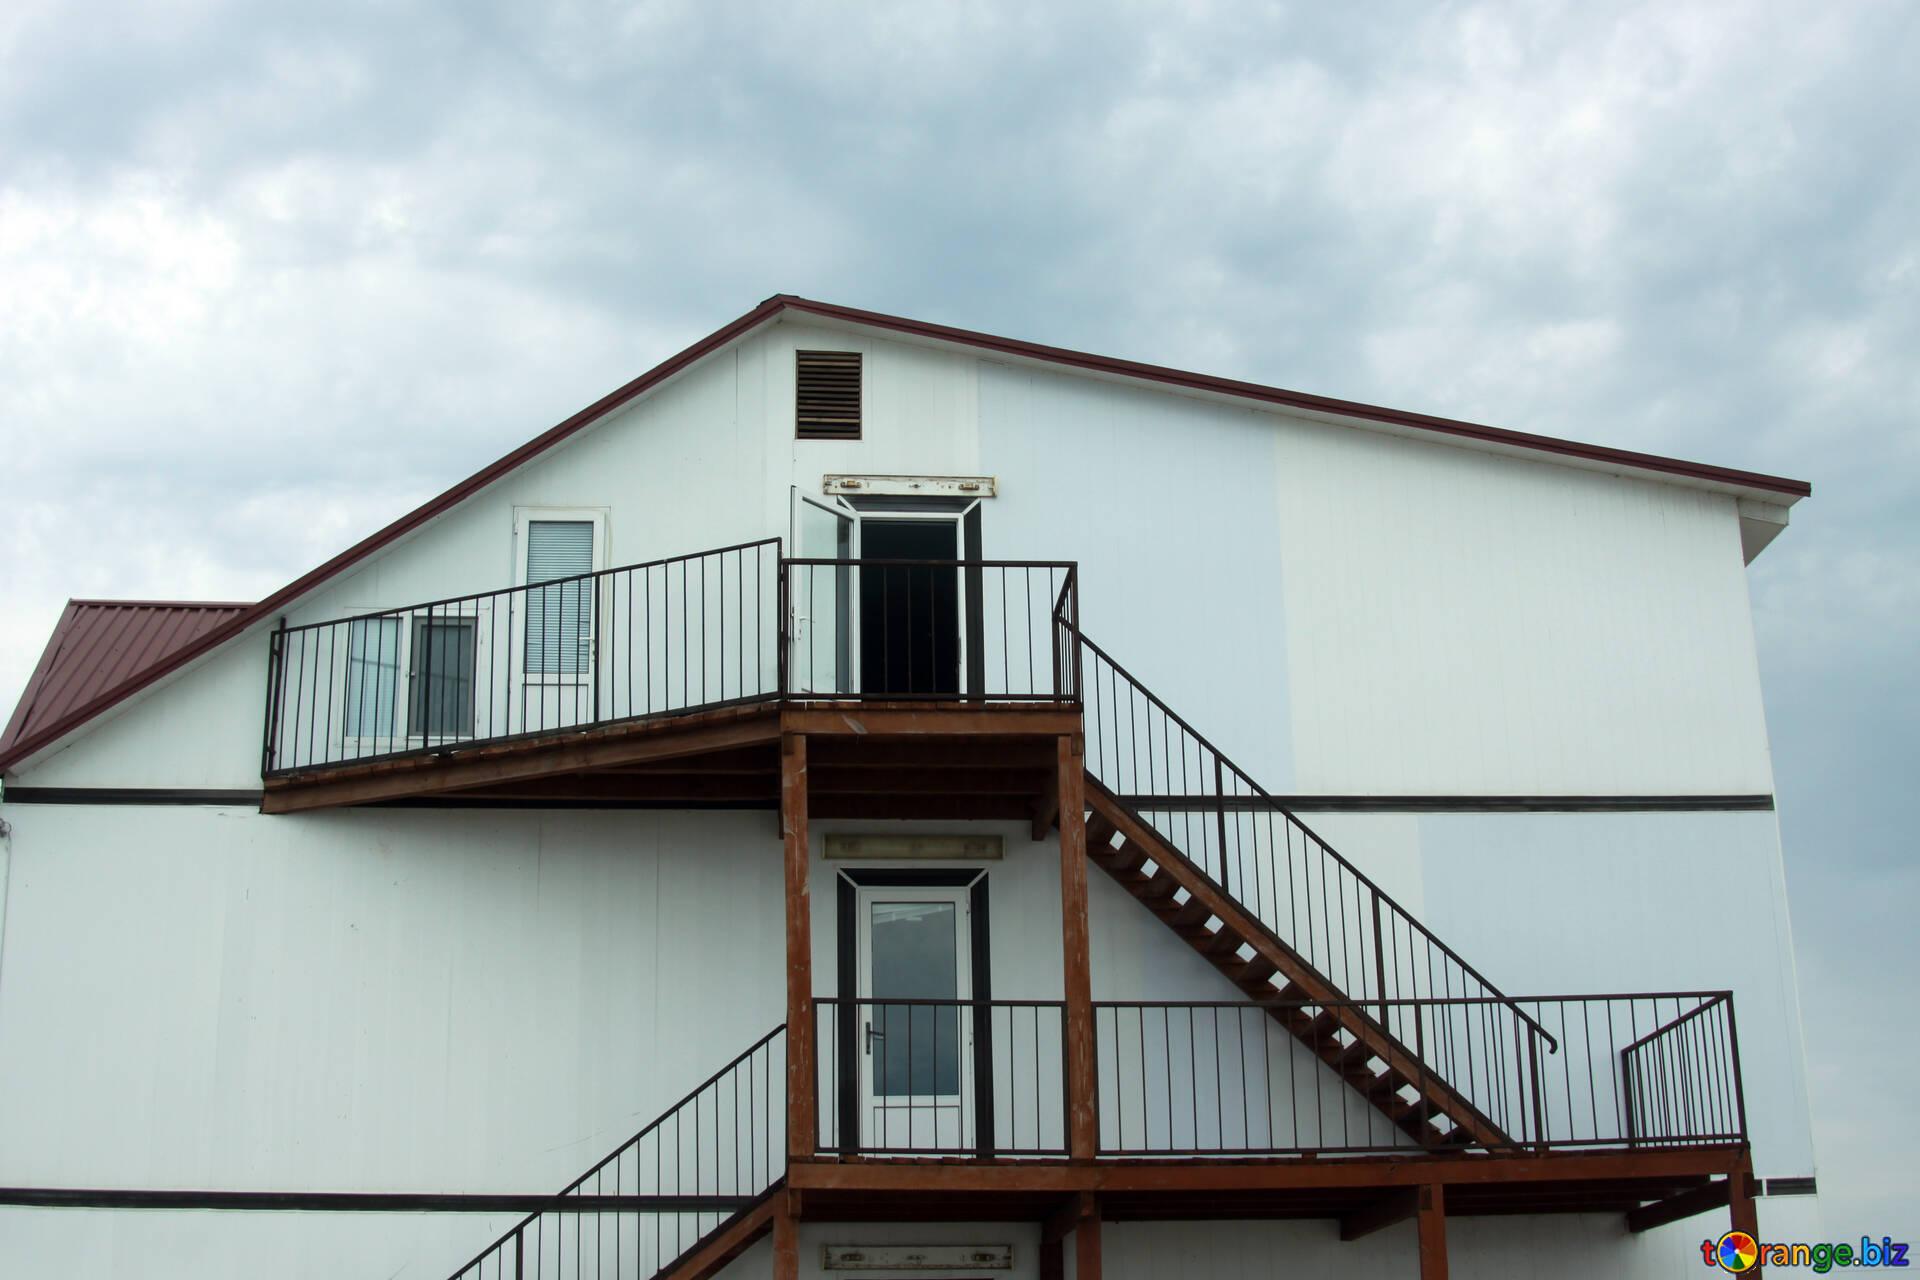 Stahlkonstruktionen metall treppe zum balkon konstruieren № 13172